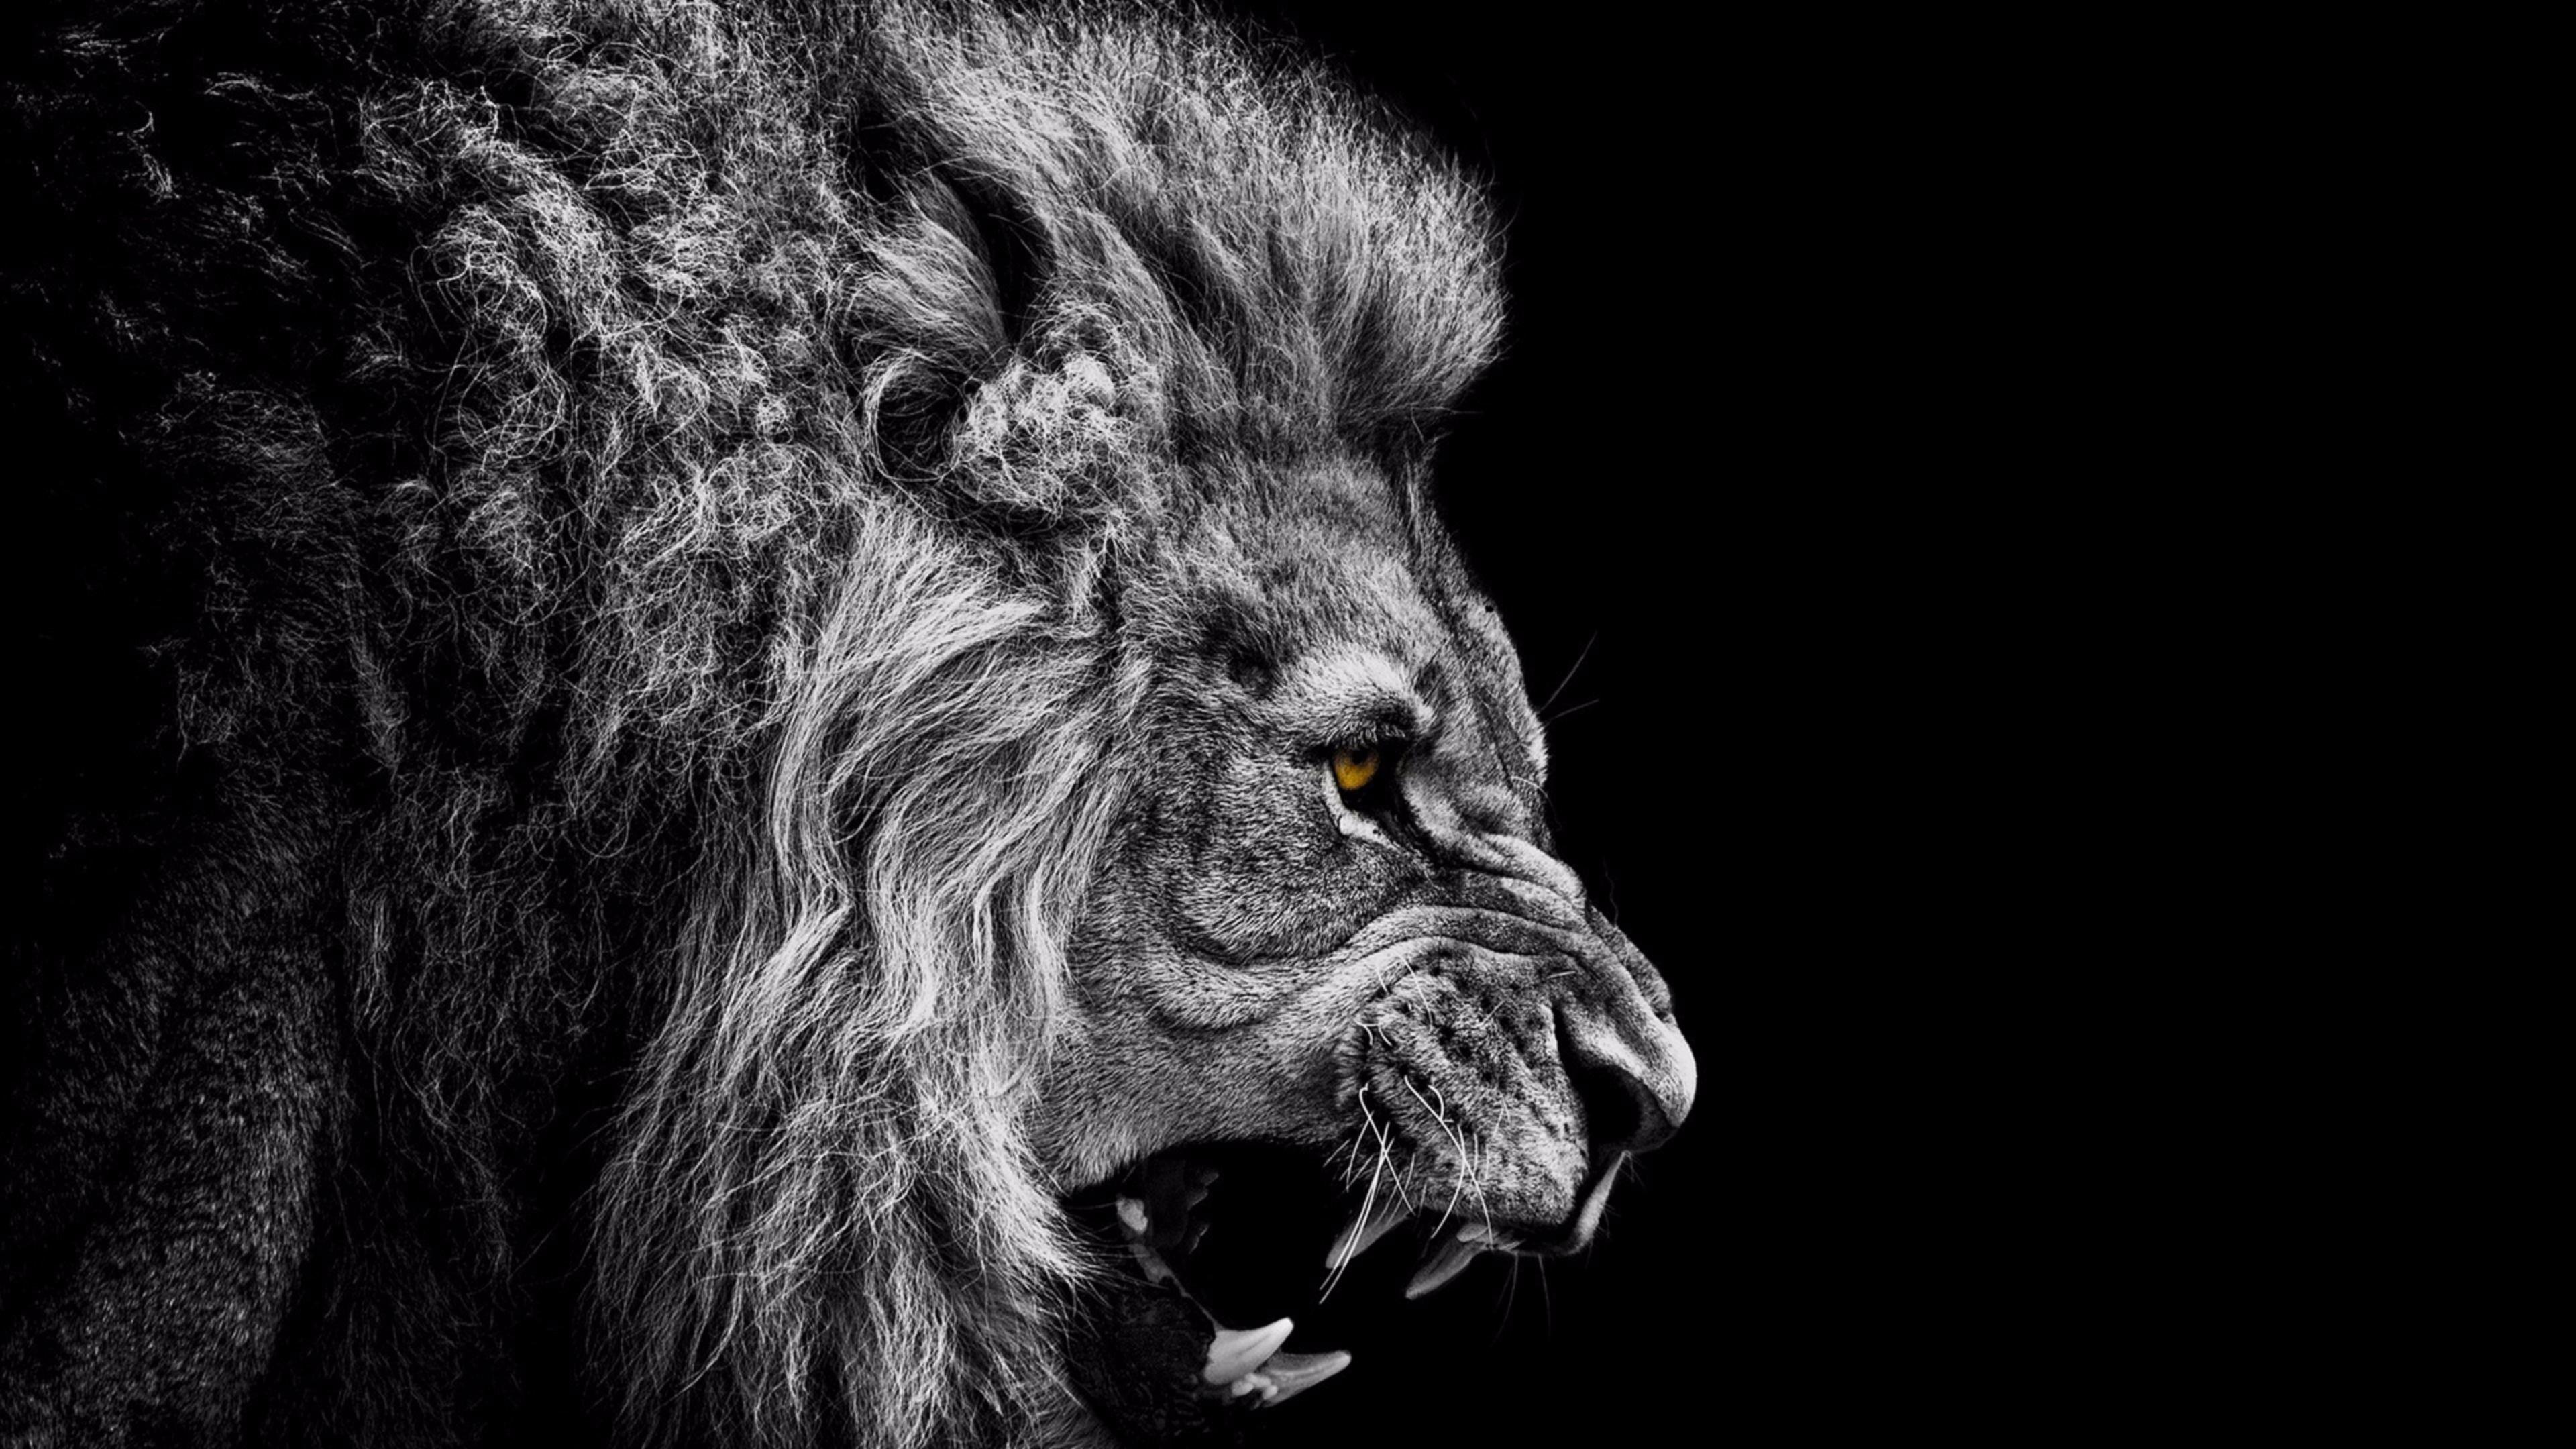 Black and White Lion 4K Wallpaper | Free 4K Wallpaper